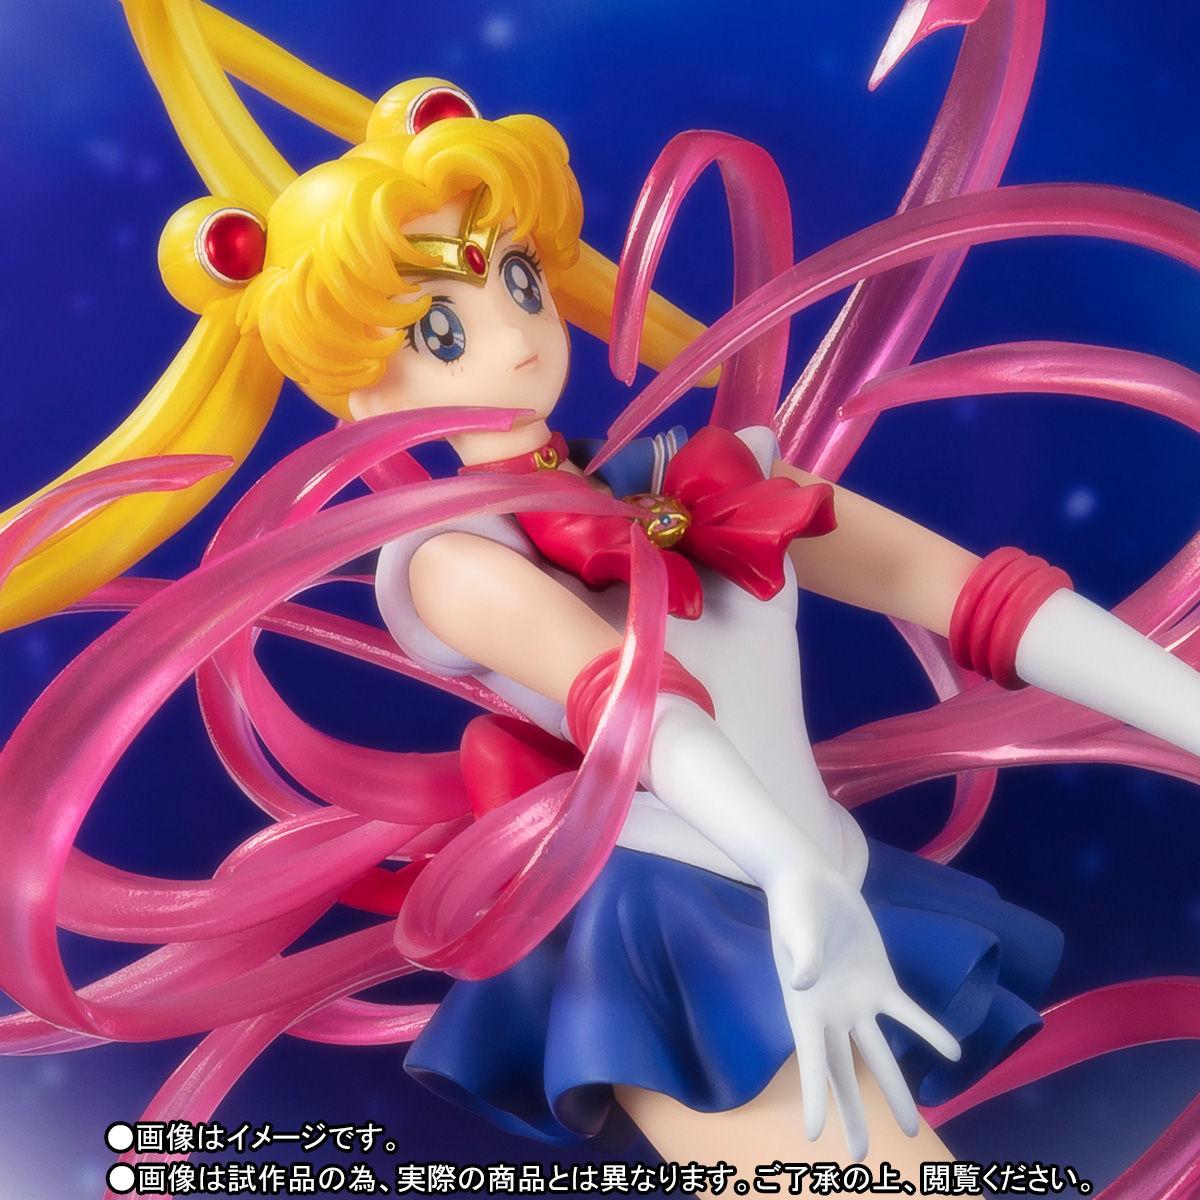 Figuarts Zero chouette『セーラームーン -Moon Crystal Power, Make Up-』完成品フィギュア